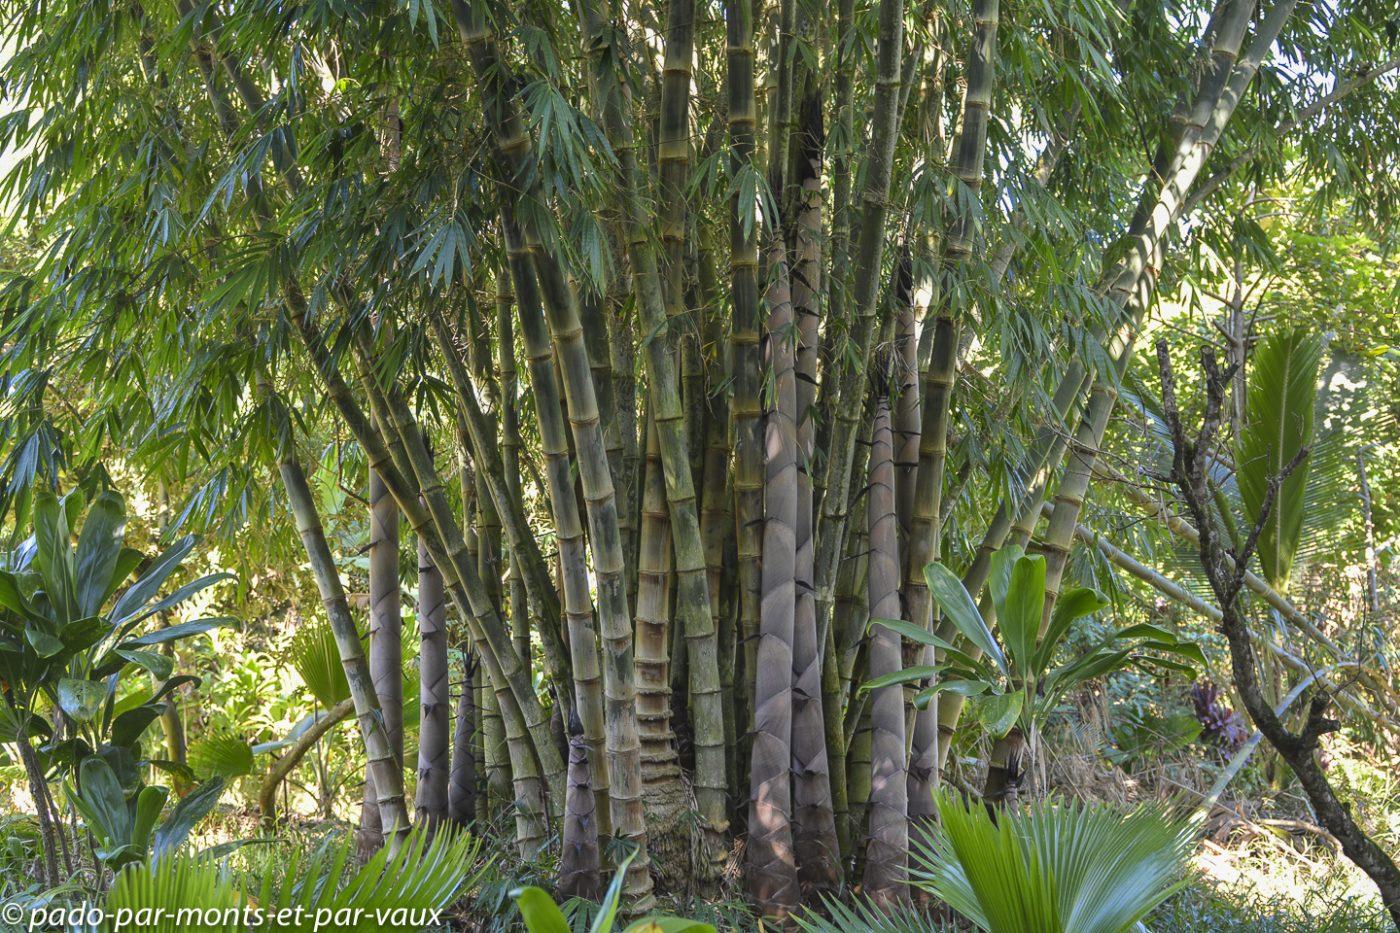 Maui - Route de Hana - Twin falls - Bambous